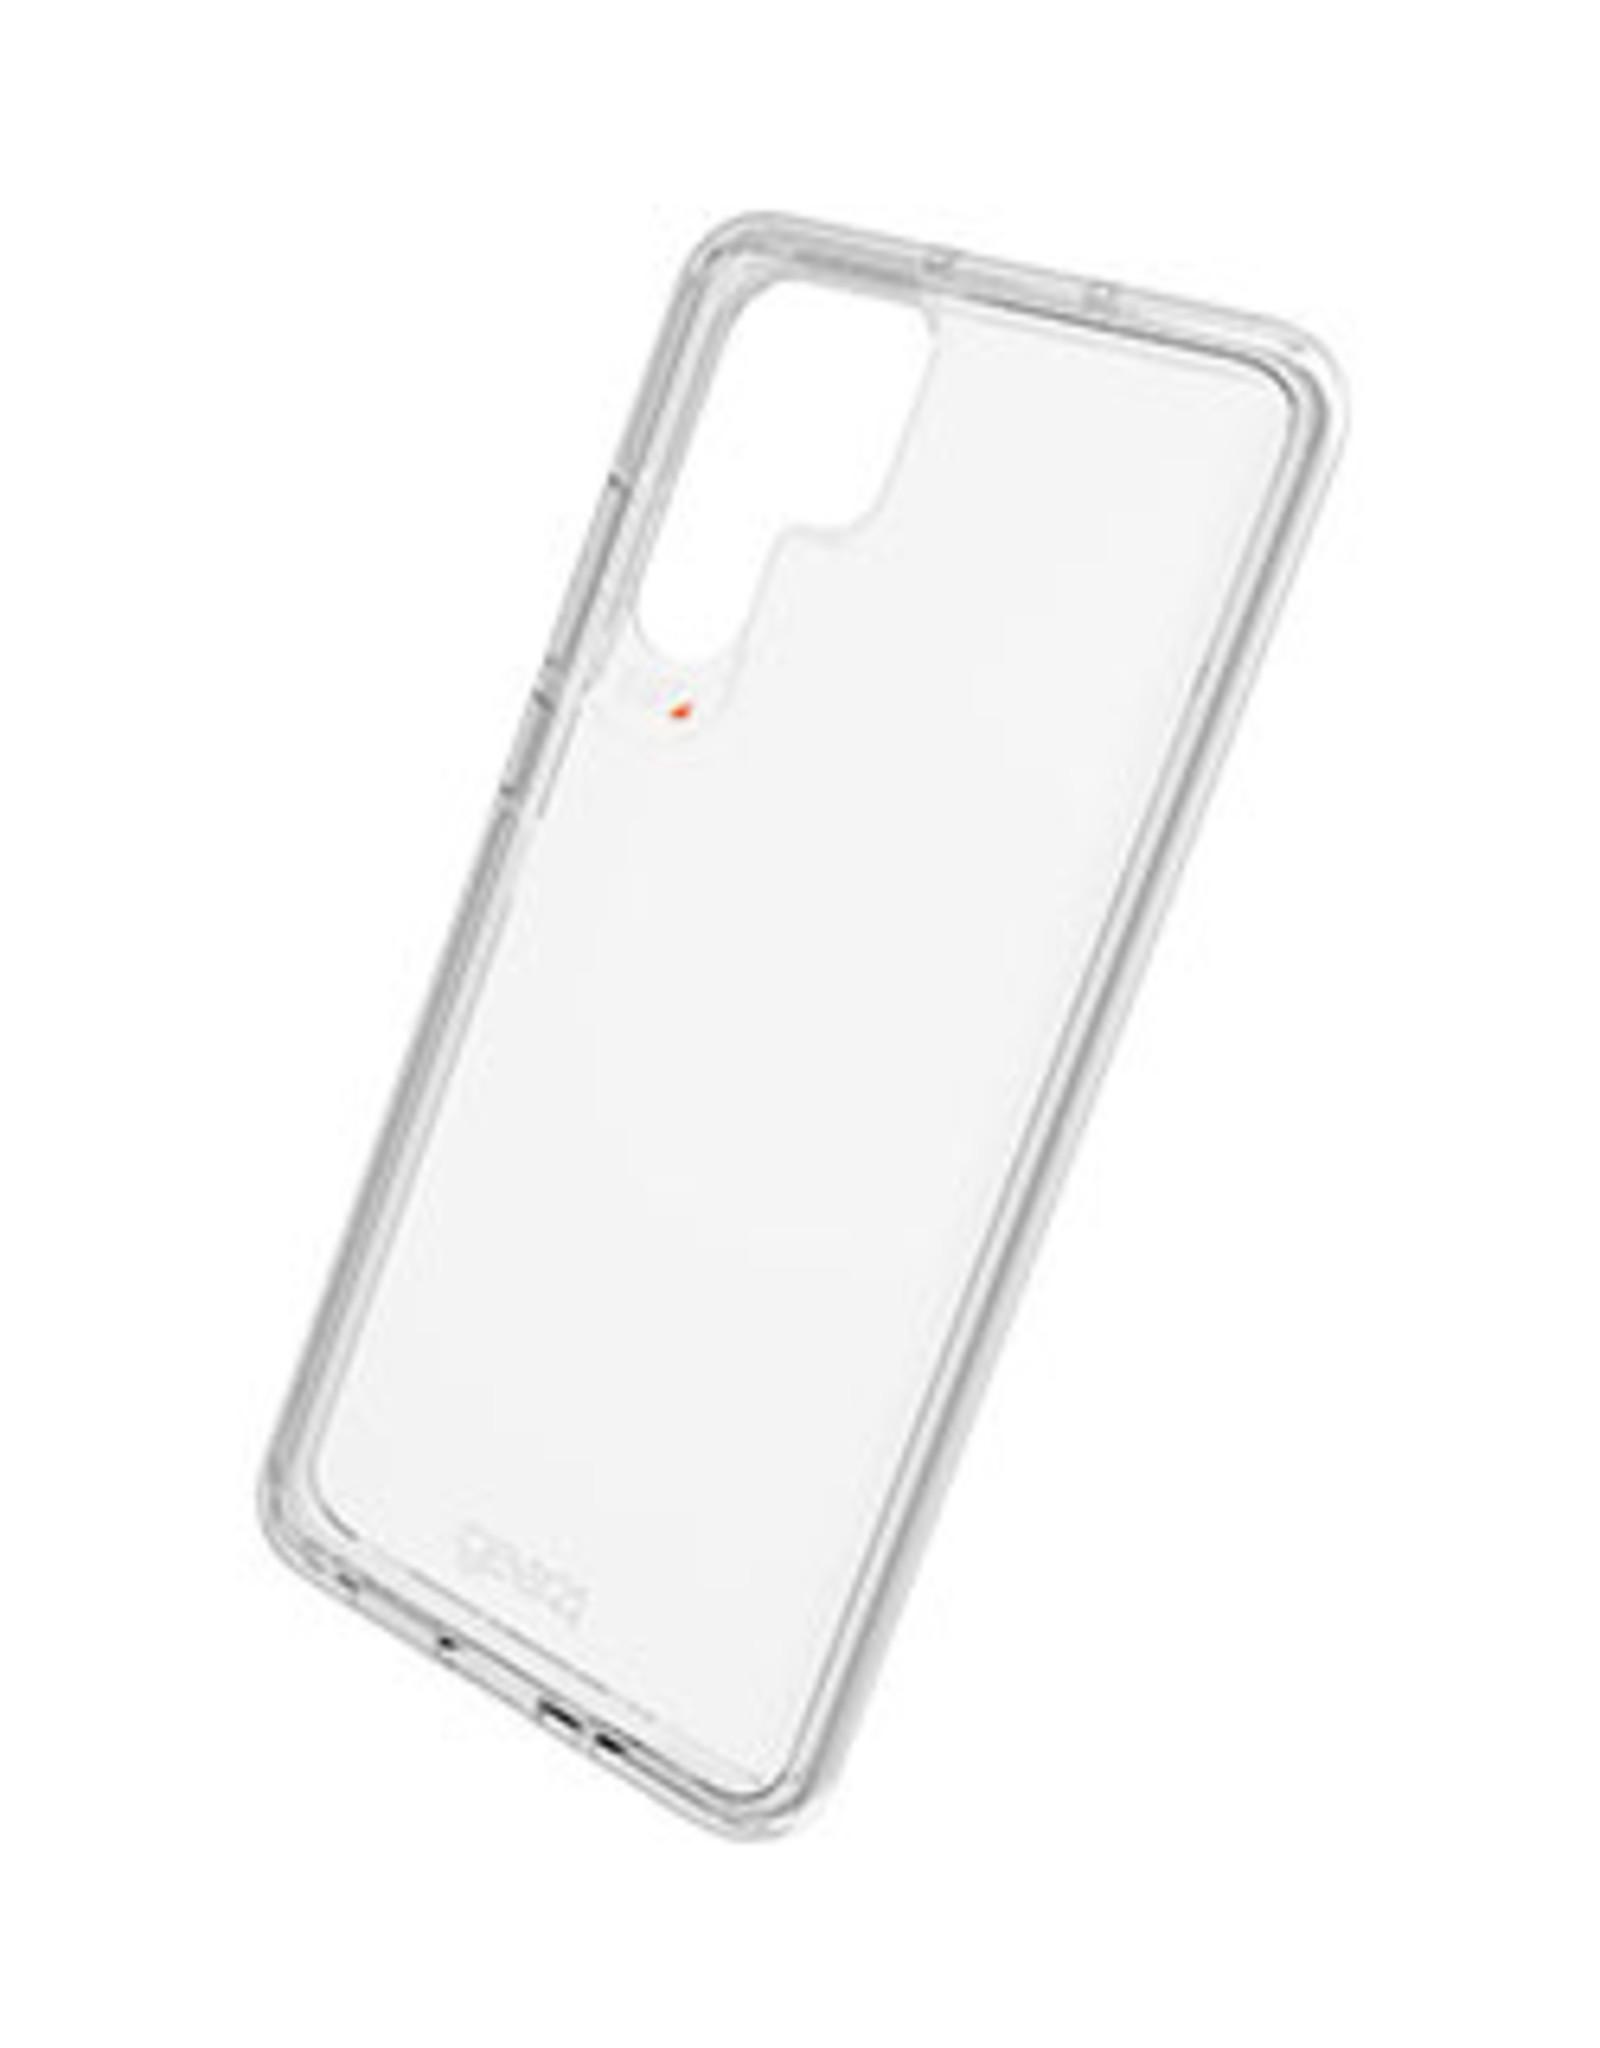 GEAR4 GEAR4 | D3O Clear Crystal Palace Huawei P30 Case  15-04257